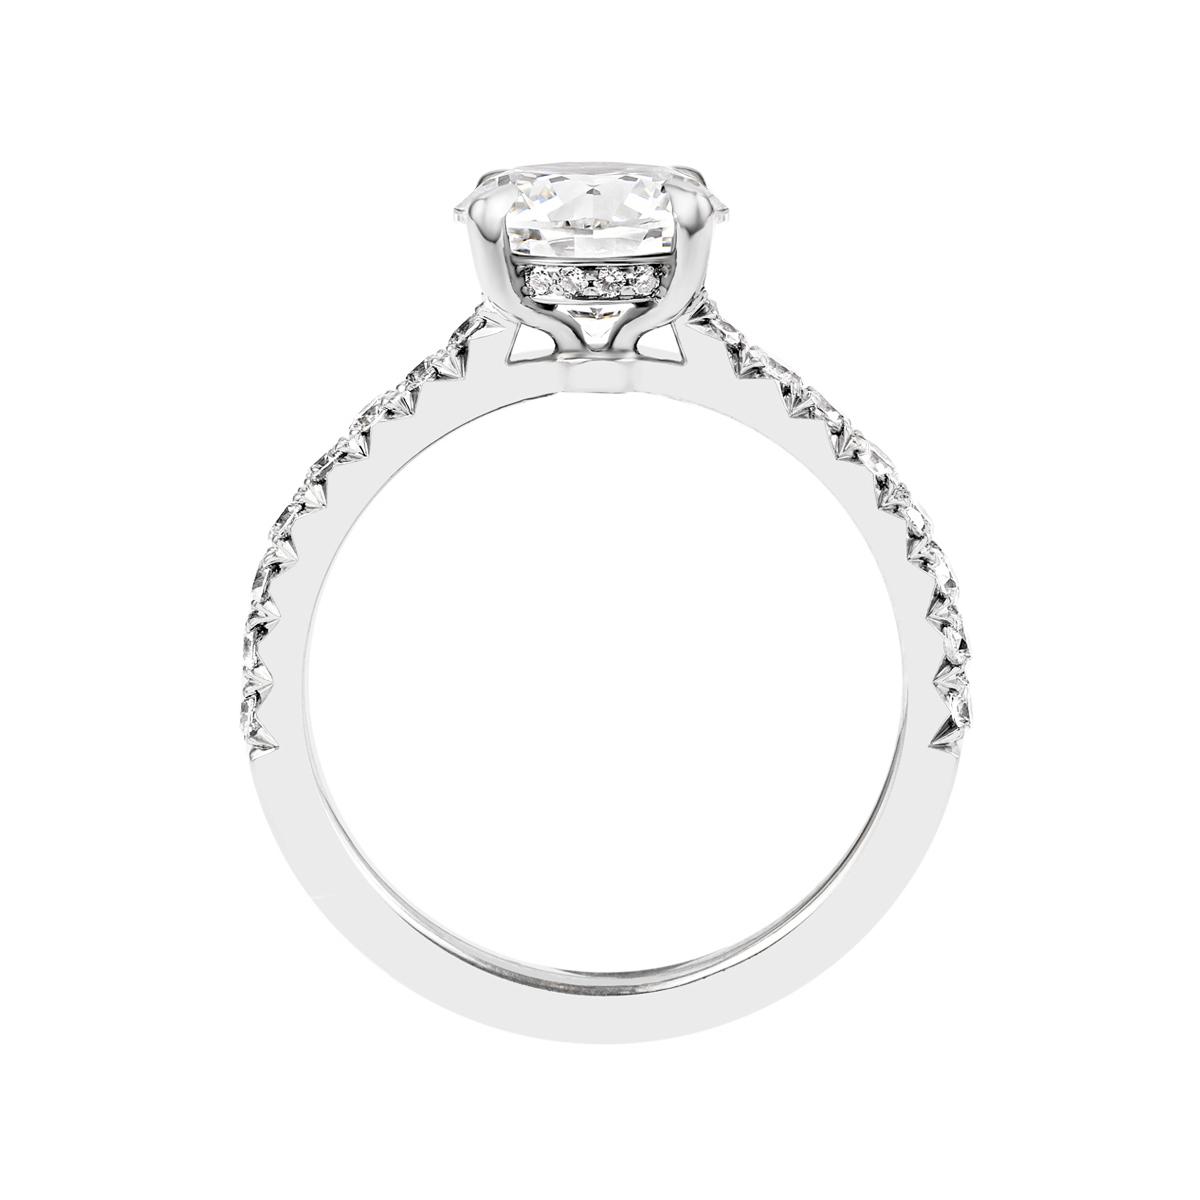 Round-frances-white-gold-diamond-set-engagement-ring-profile.jpg